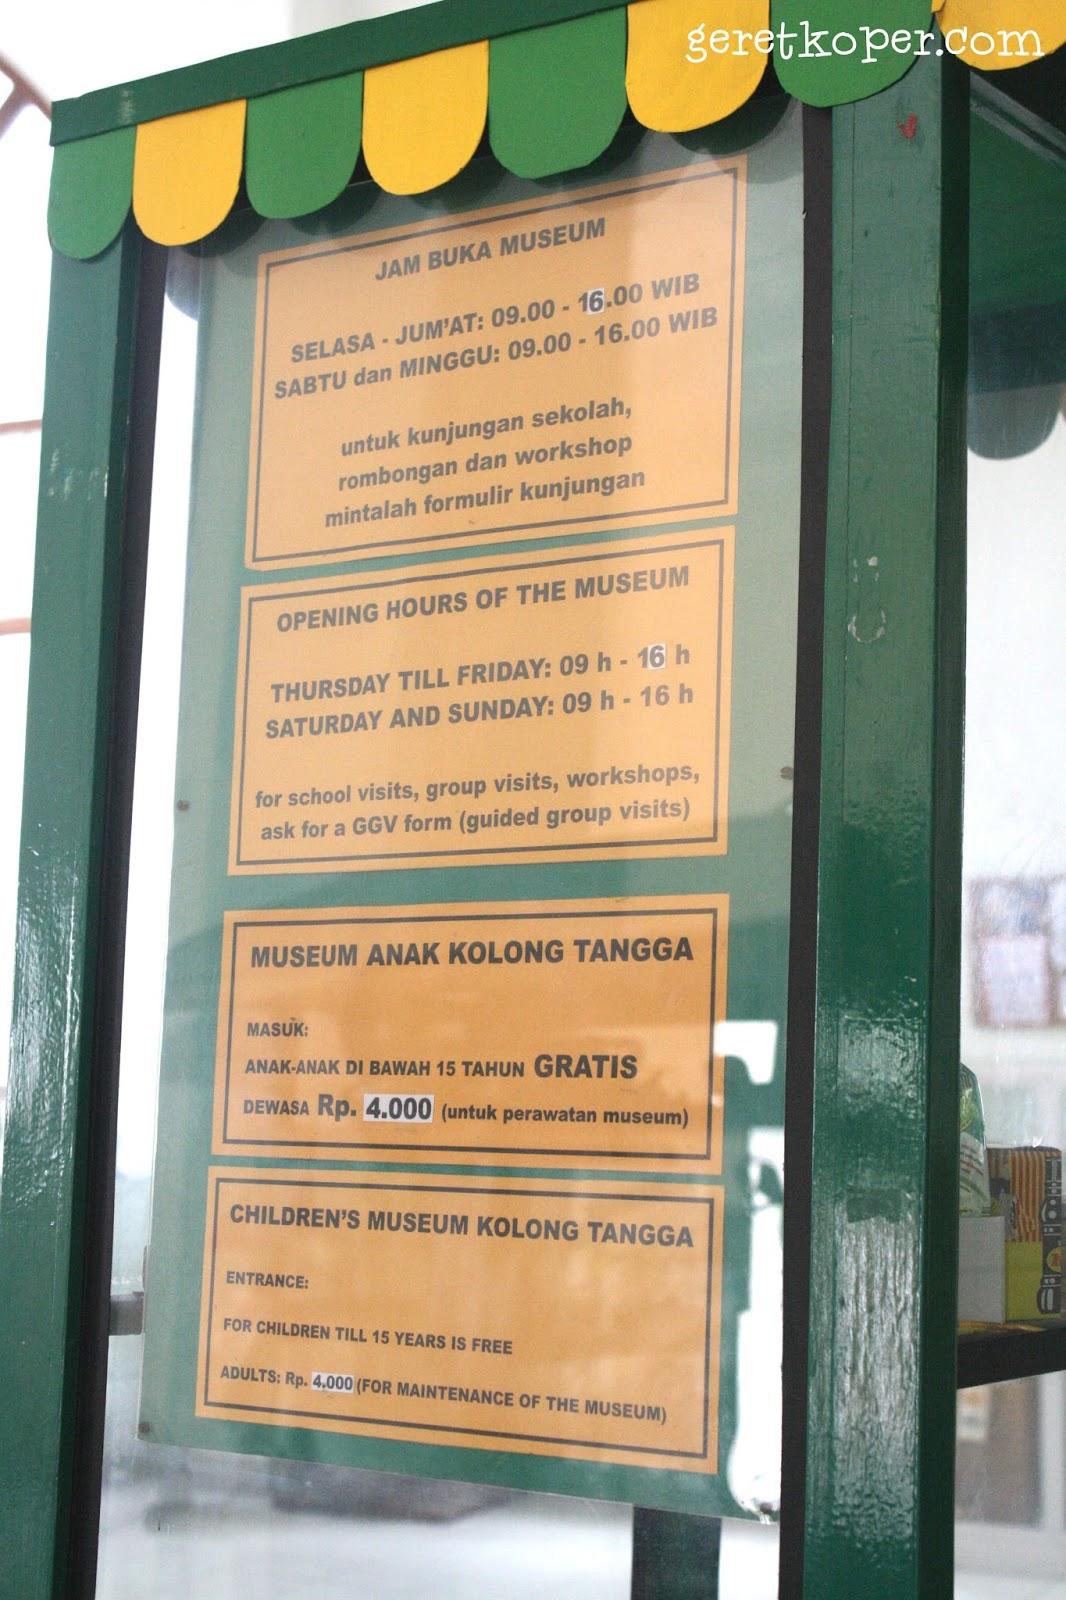 Berkunjung Museum Anak Kolong Tangga Yogyakarta Geret Koper Harga Tiket